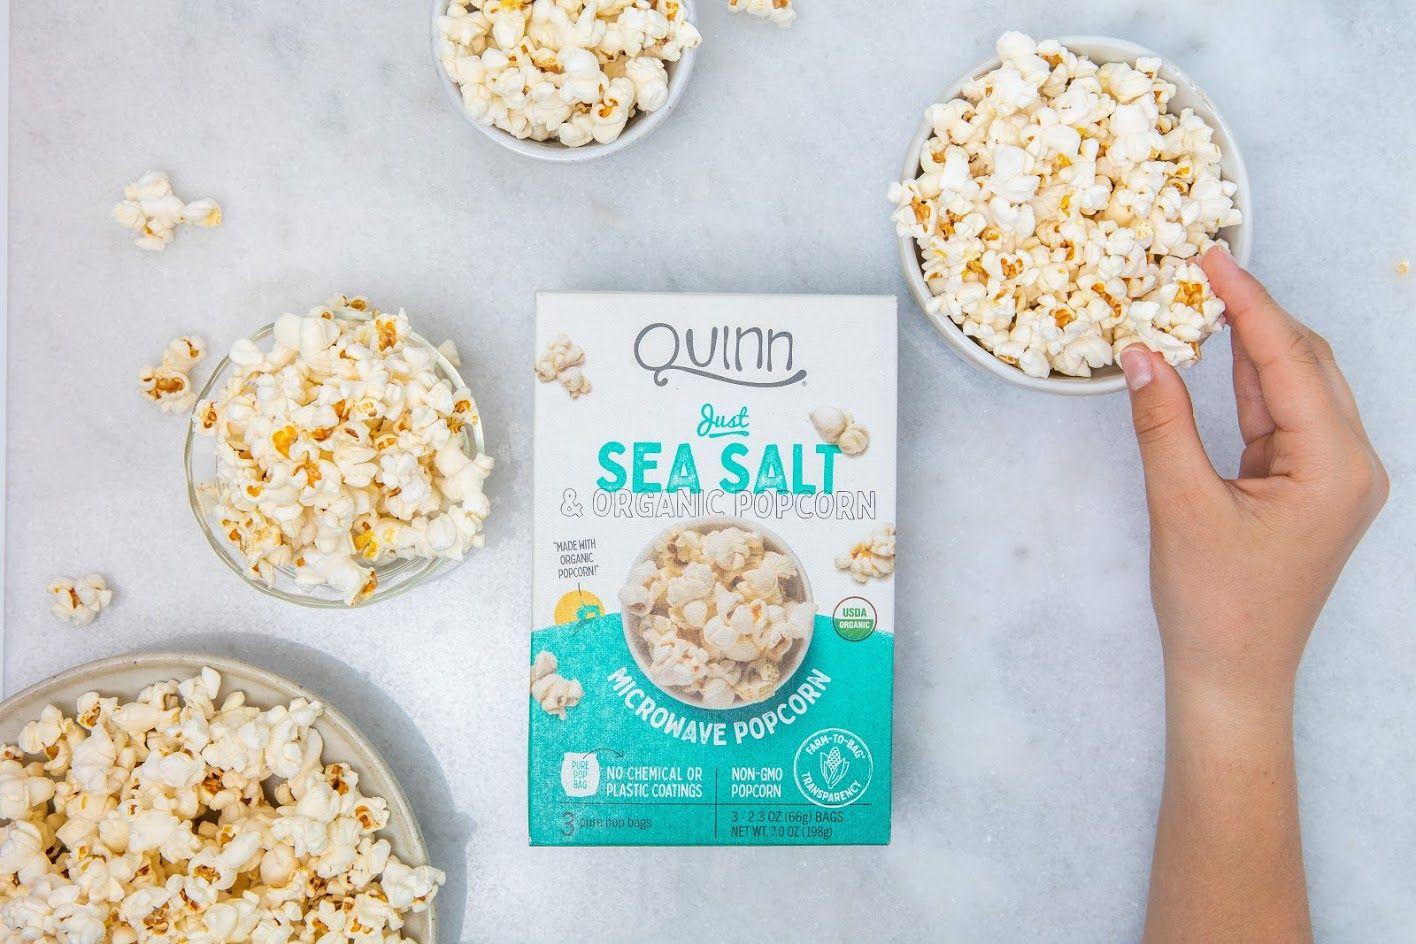 quinn just sea salt pure pop